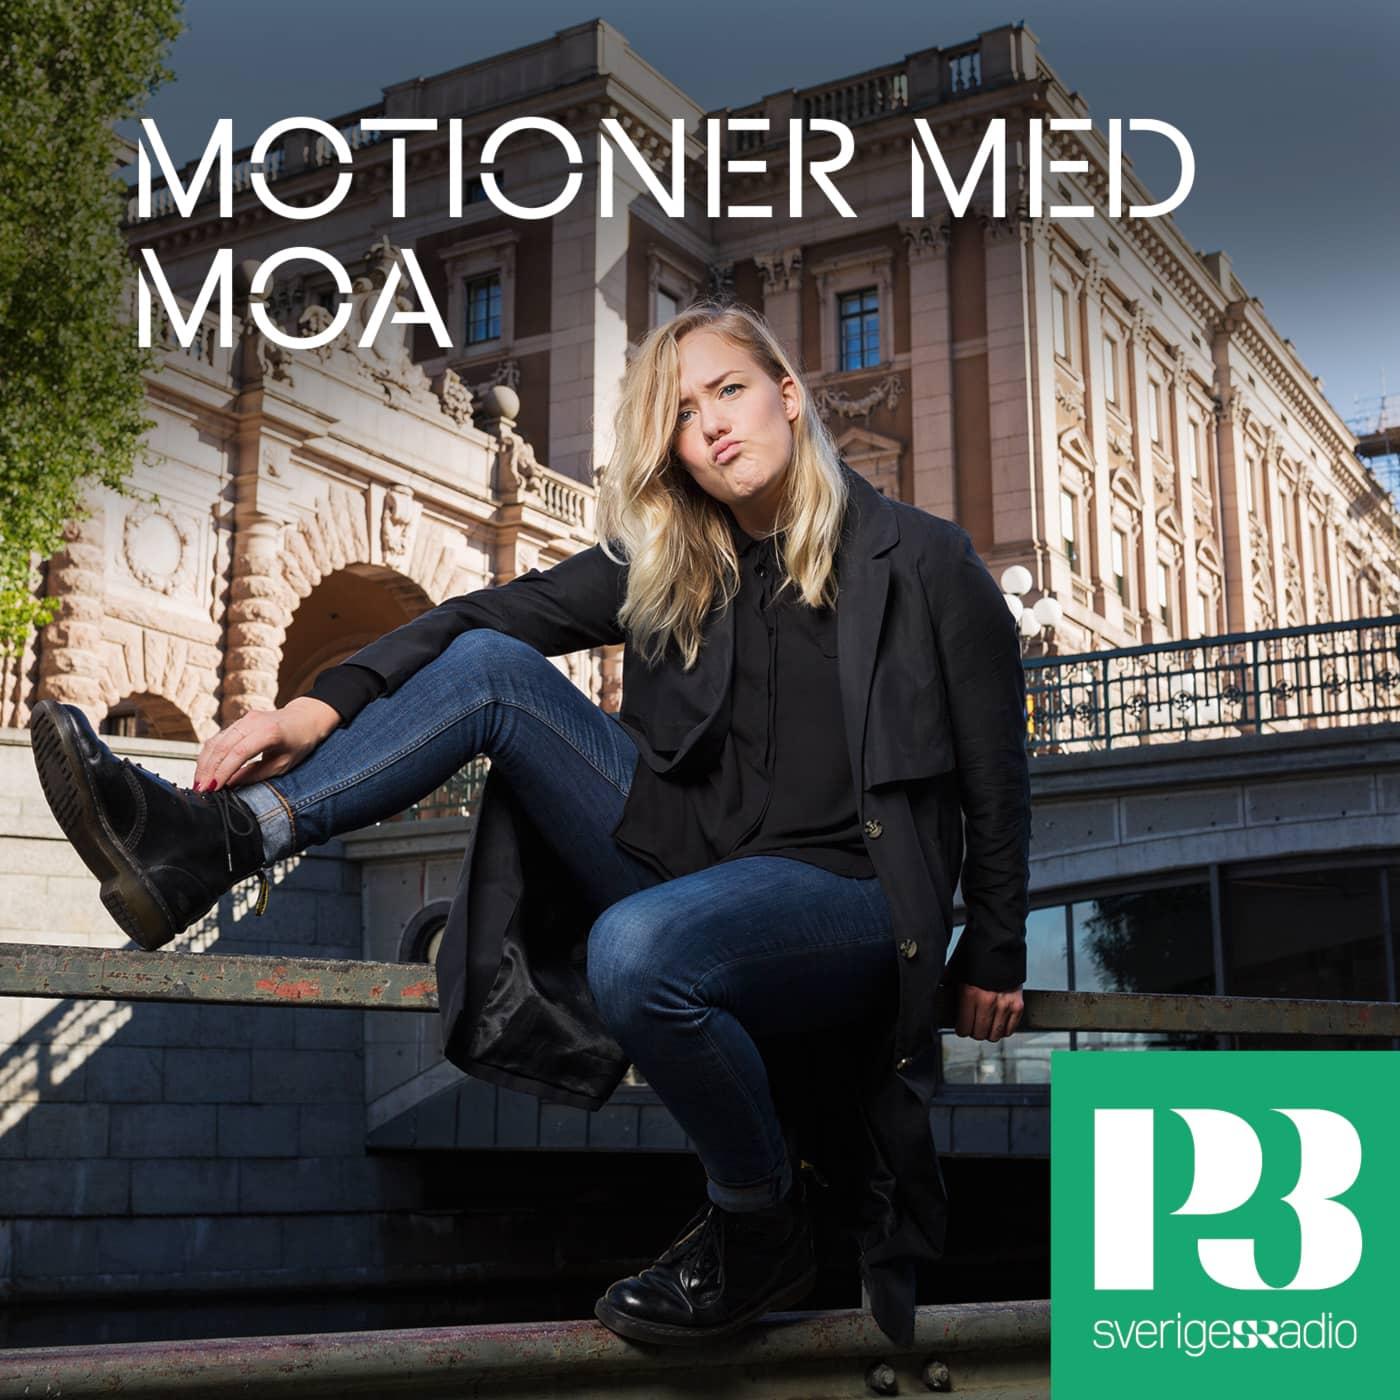 Motioner med Moa